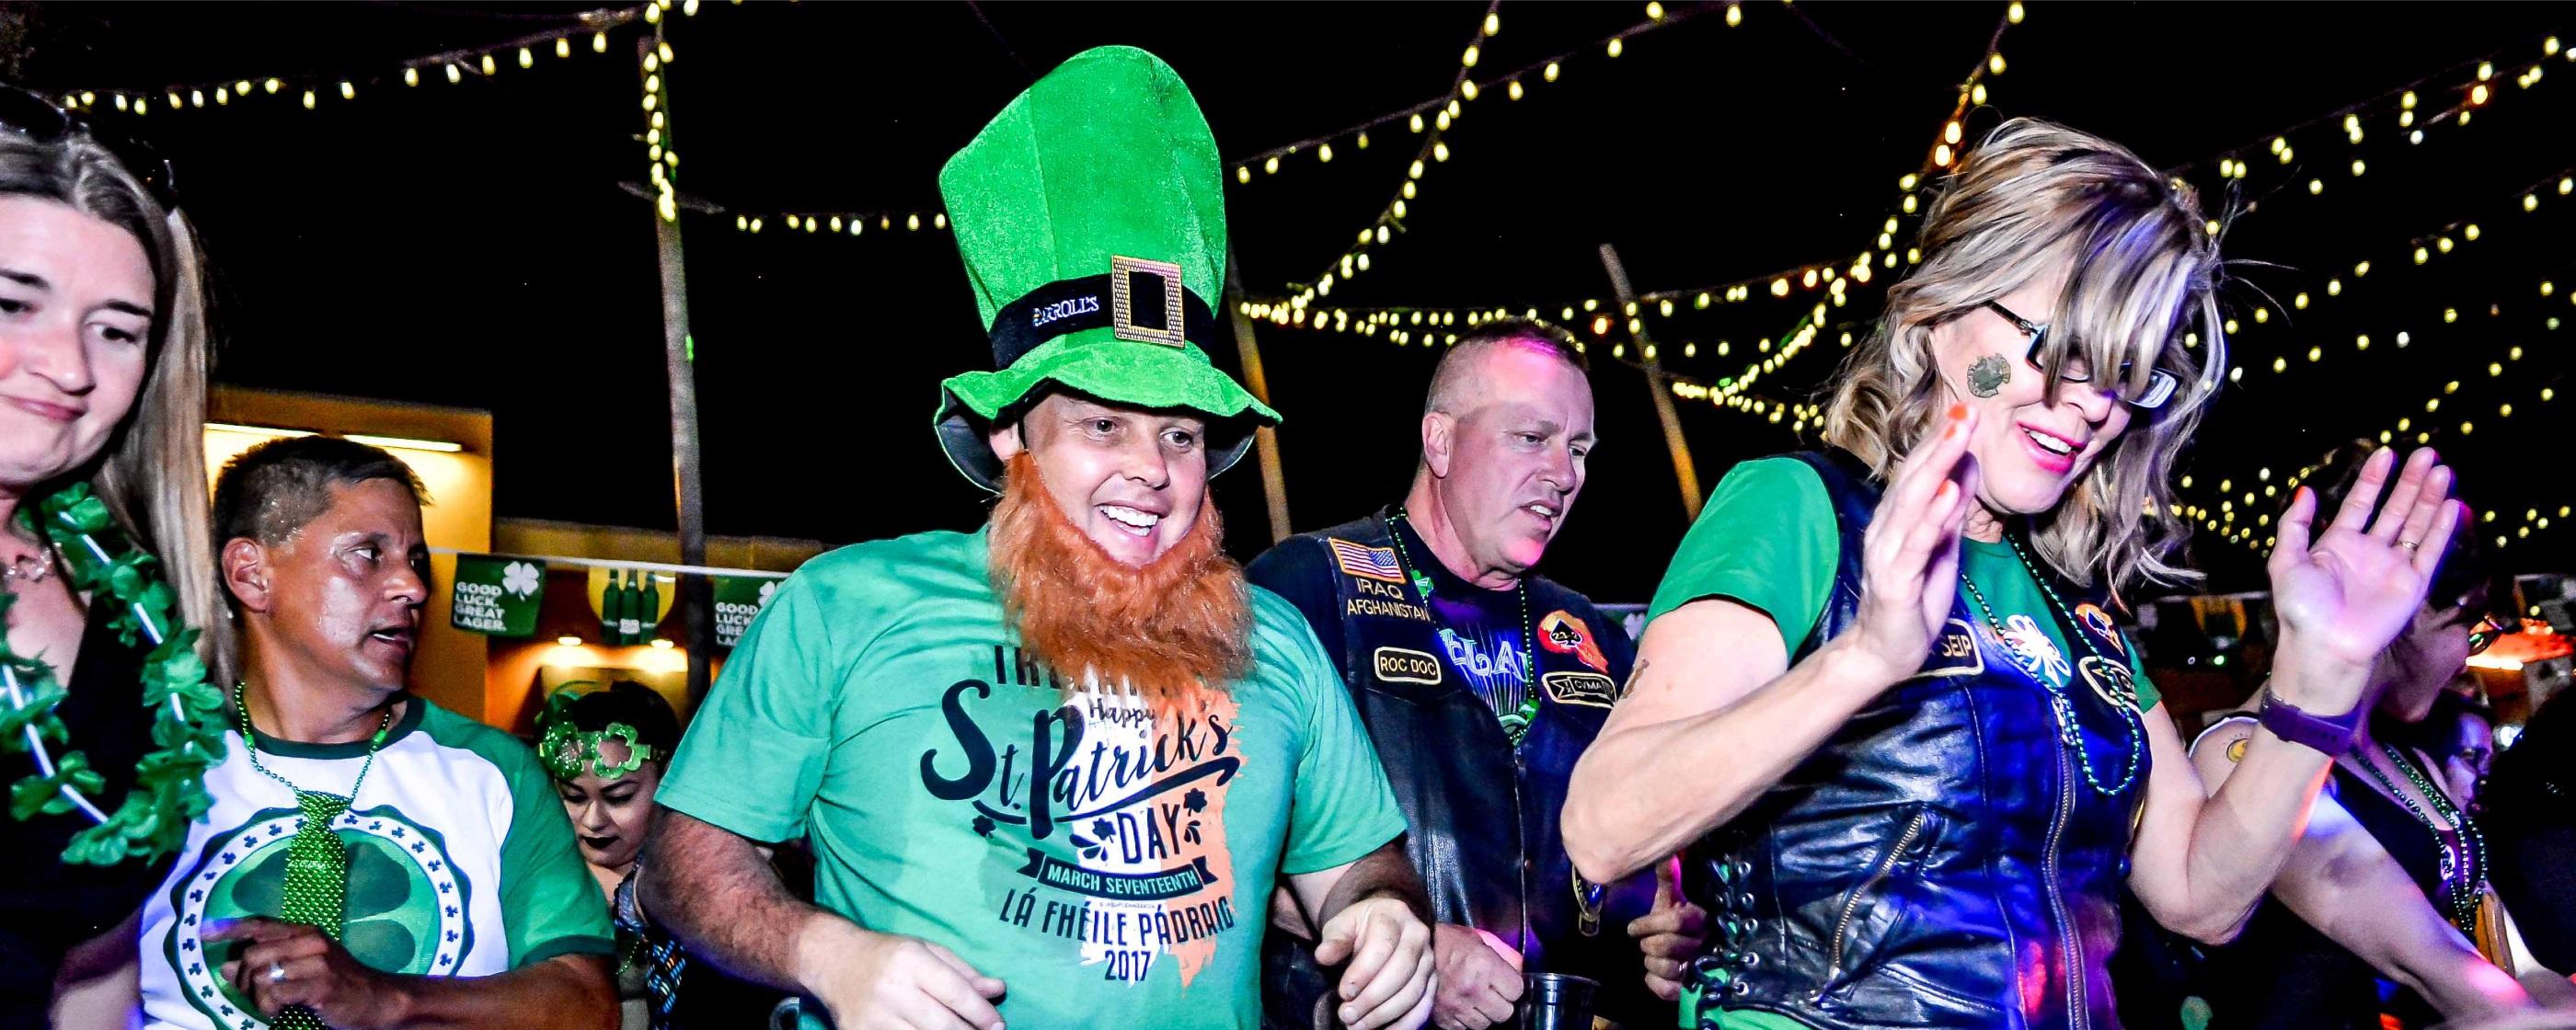 El Paso's St. Patrick's Day Events